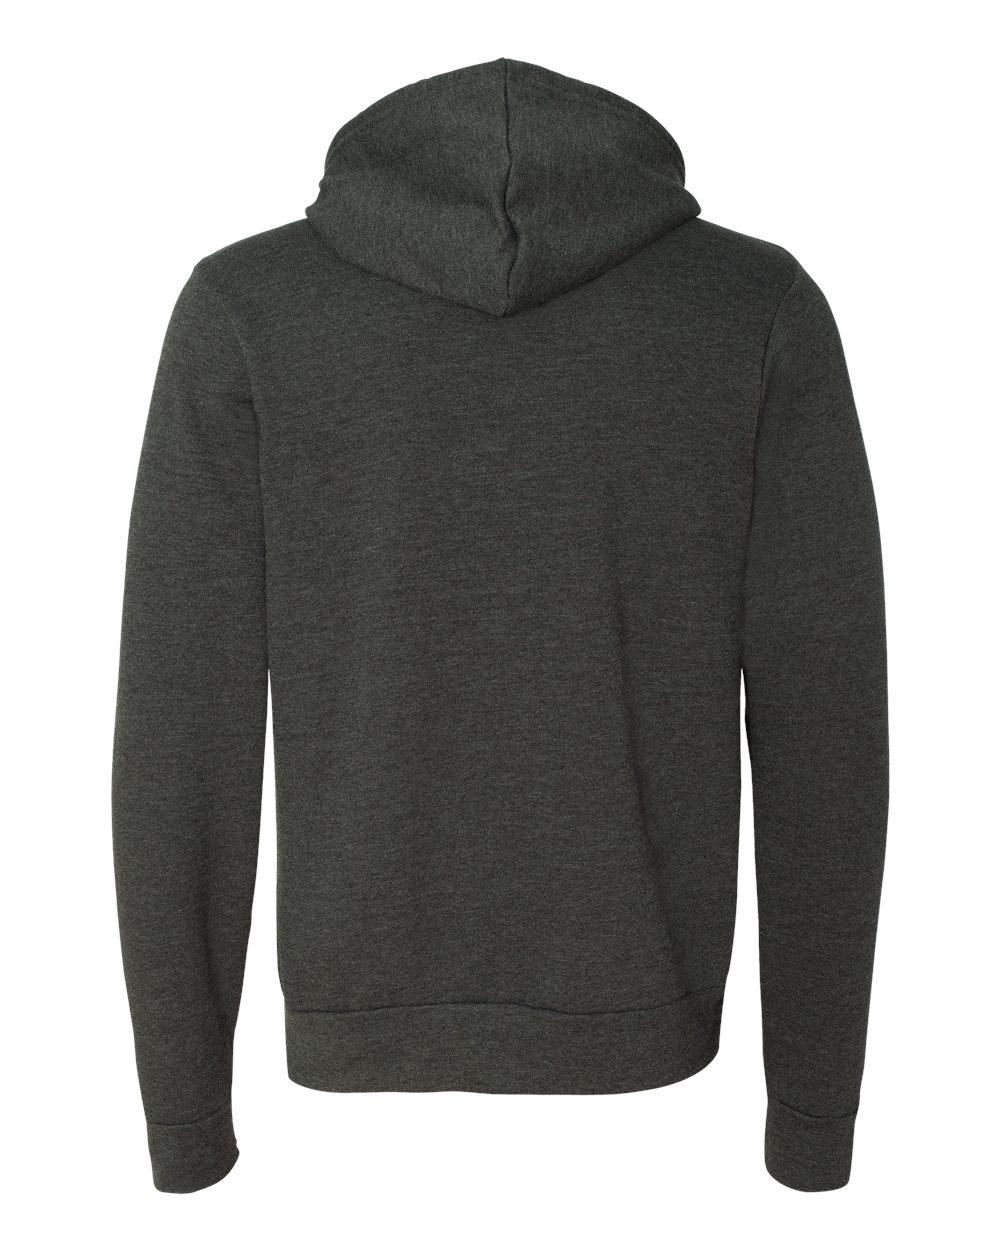 Bella-Canvas-Unisex-Sponge-Hooded-Pullover-Sweatshirt-Blank-3719-up-to-2XL thumbnail 20